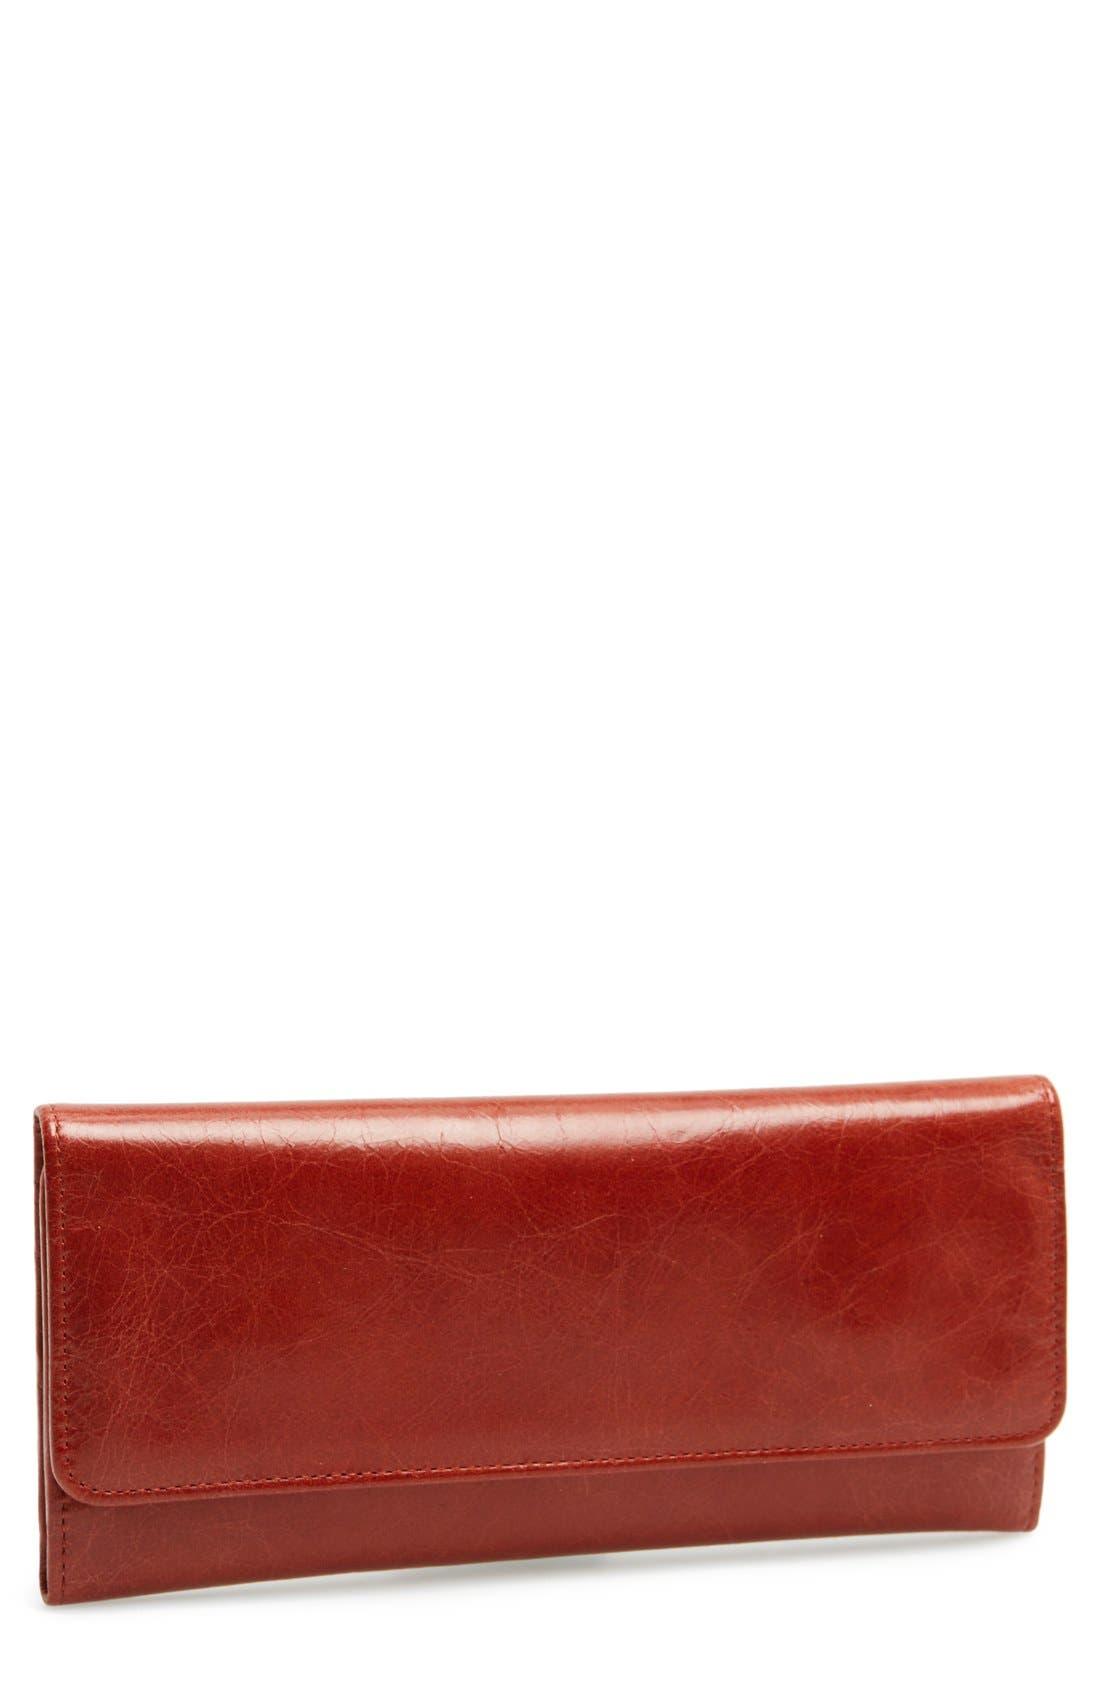 'Sadie' Leather Wallet,                             Main thumbnail 27, color,